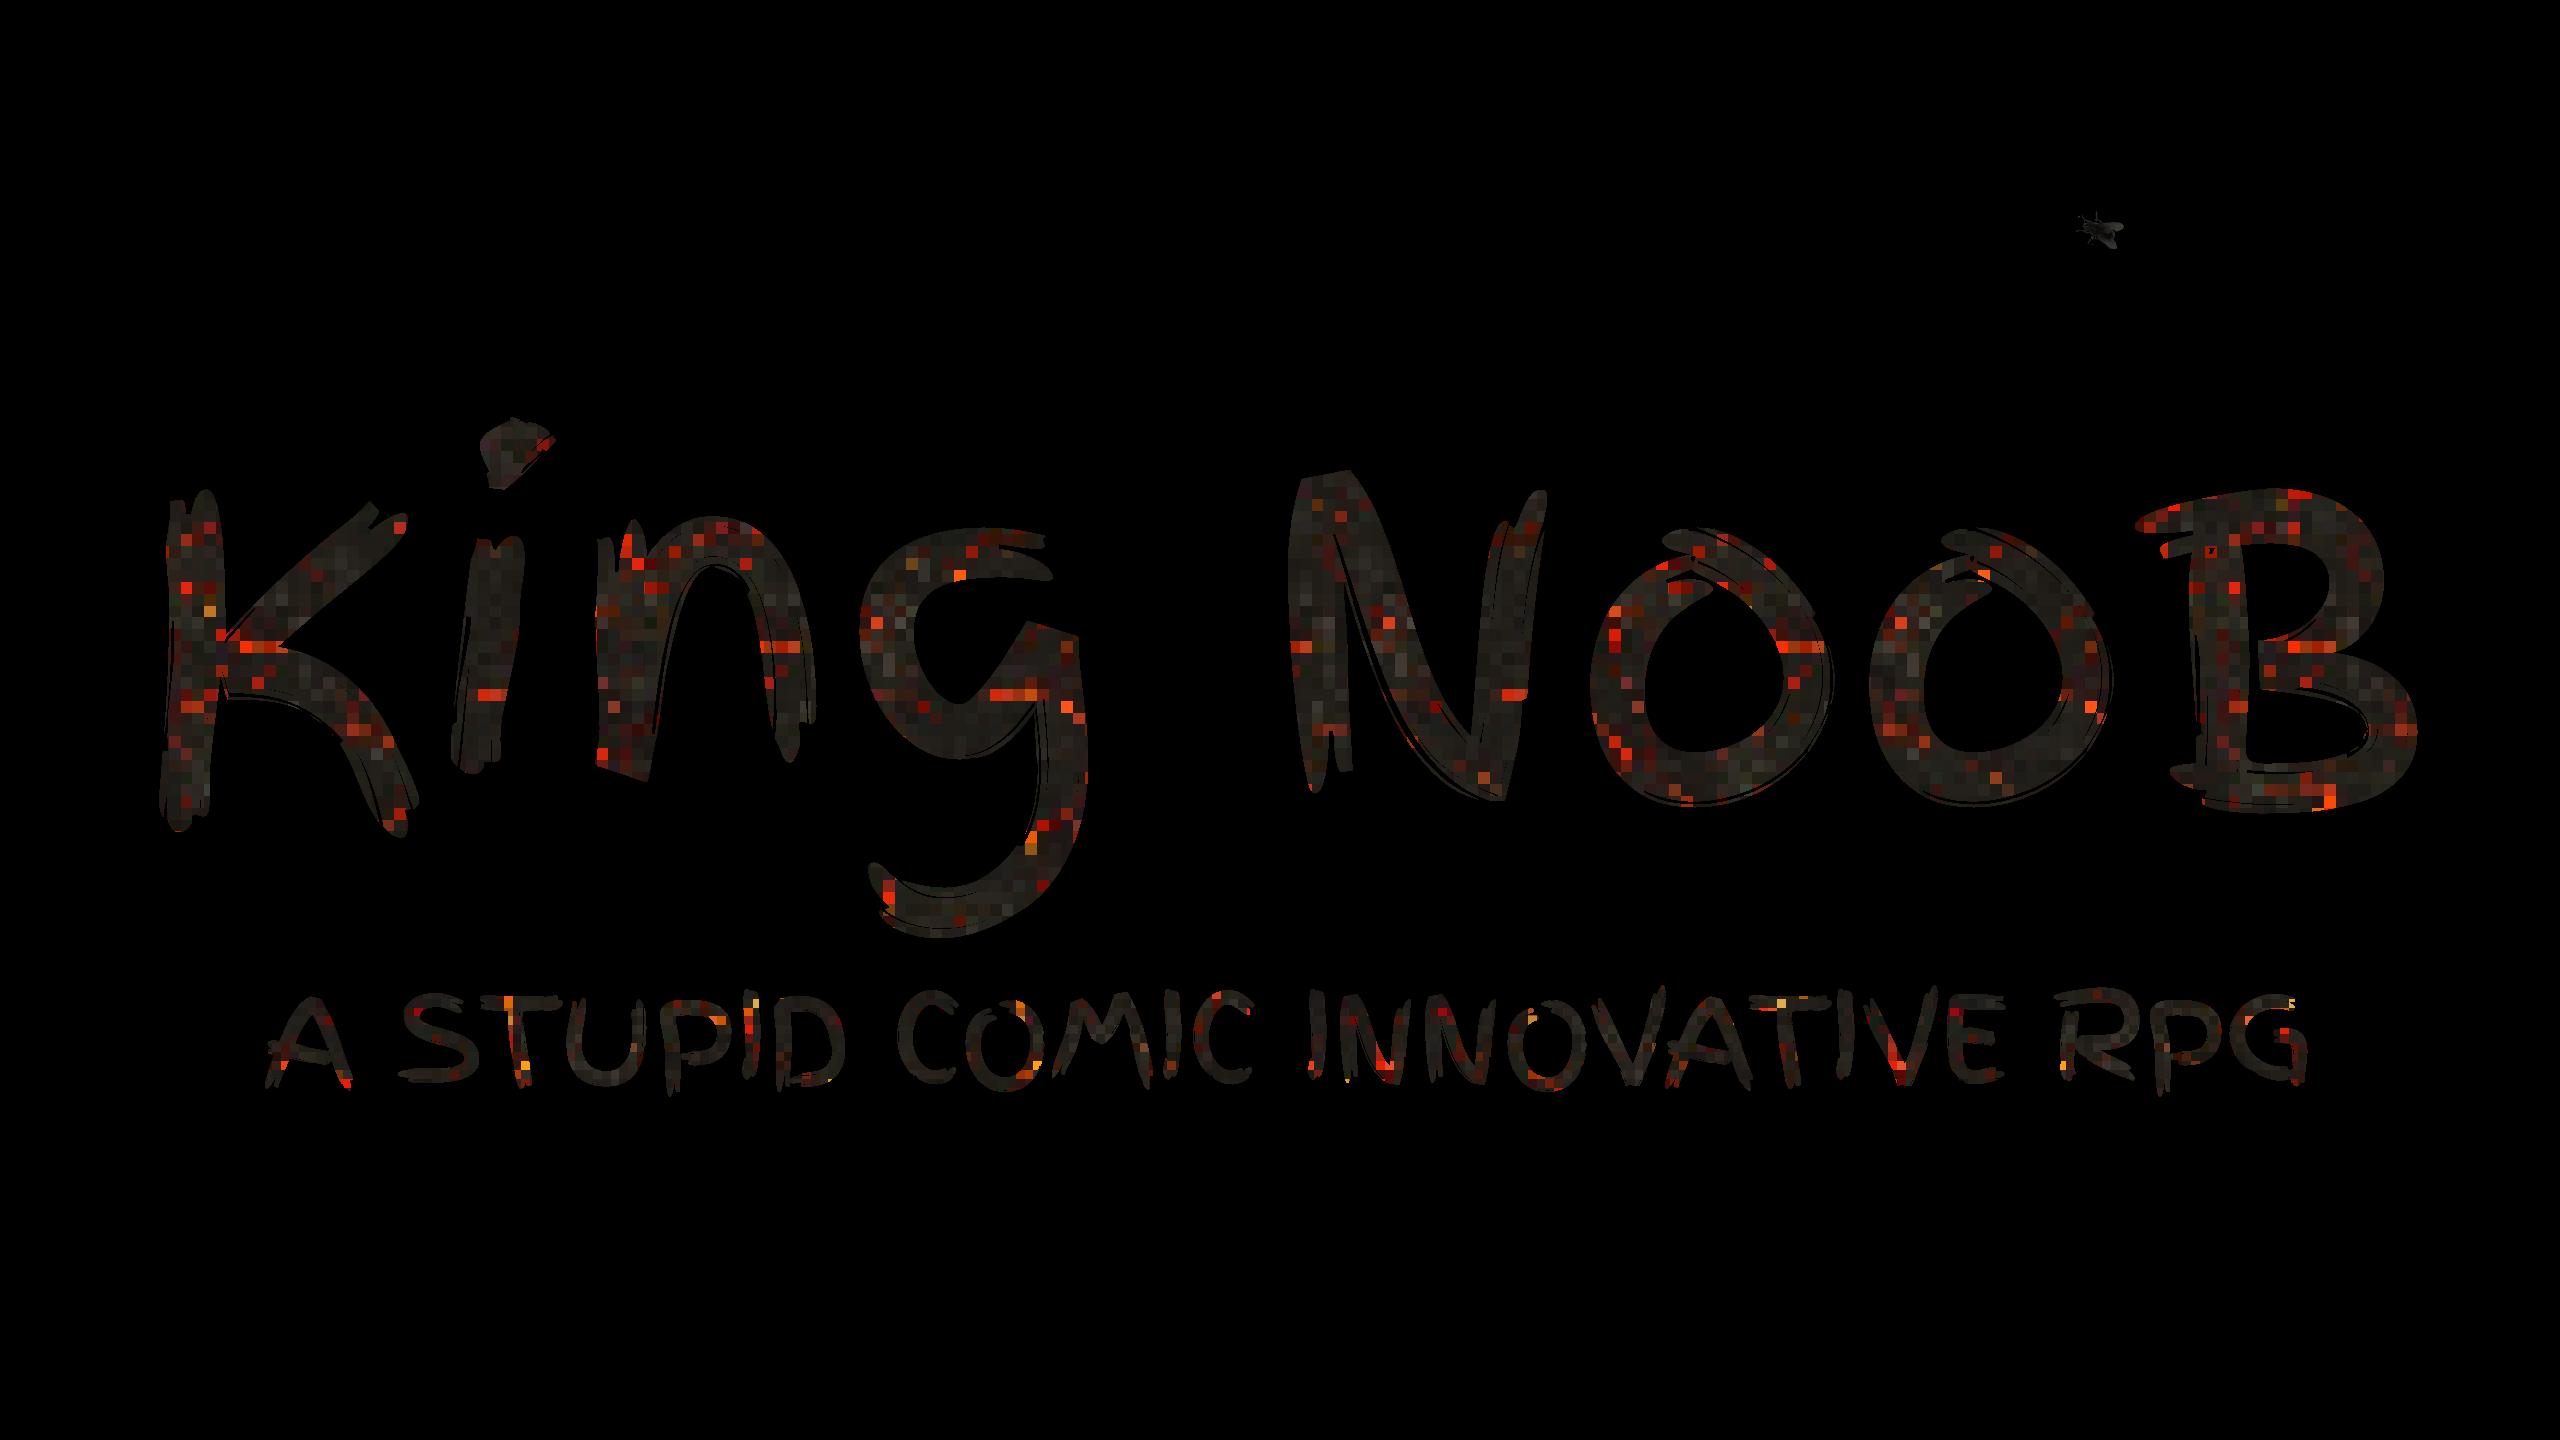 King NooB